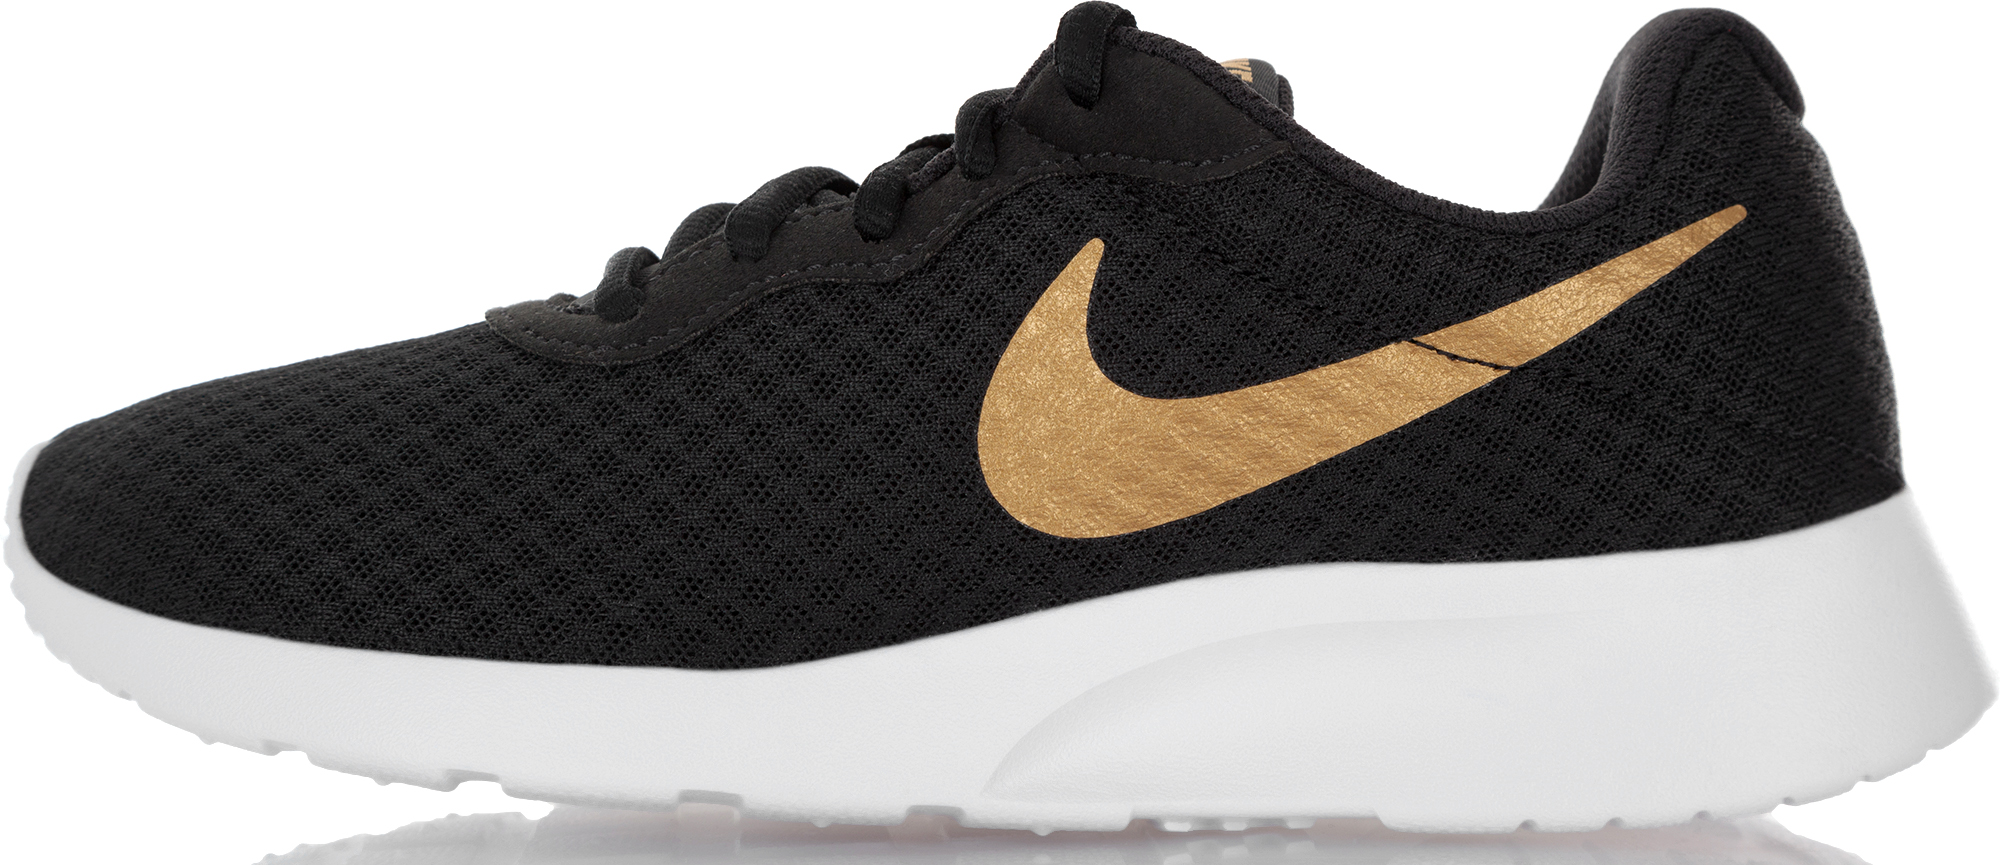 Nike Кроссовки женские Nike Tanjun кроссовки timejump кроссовки женские